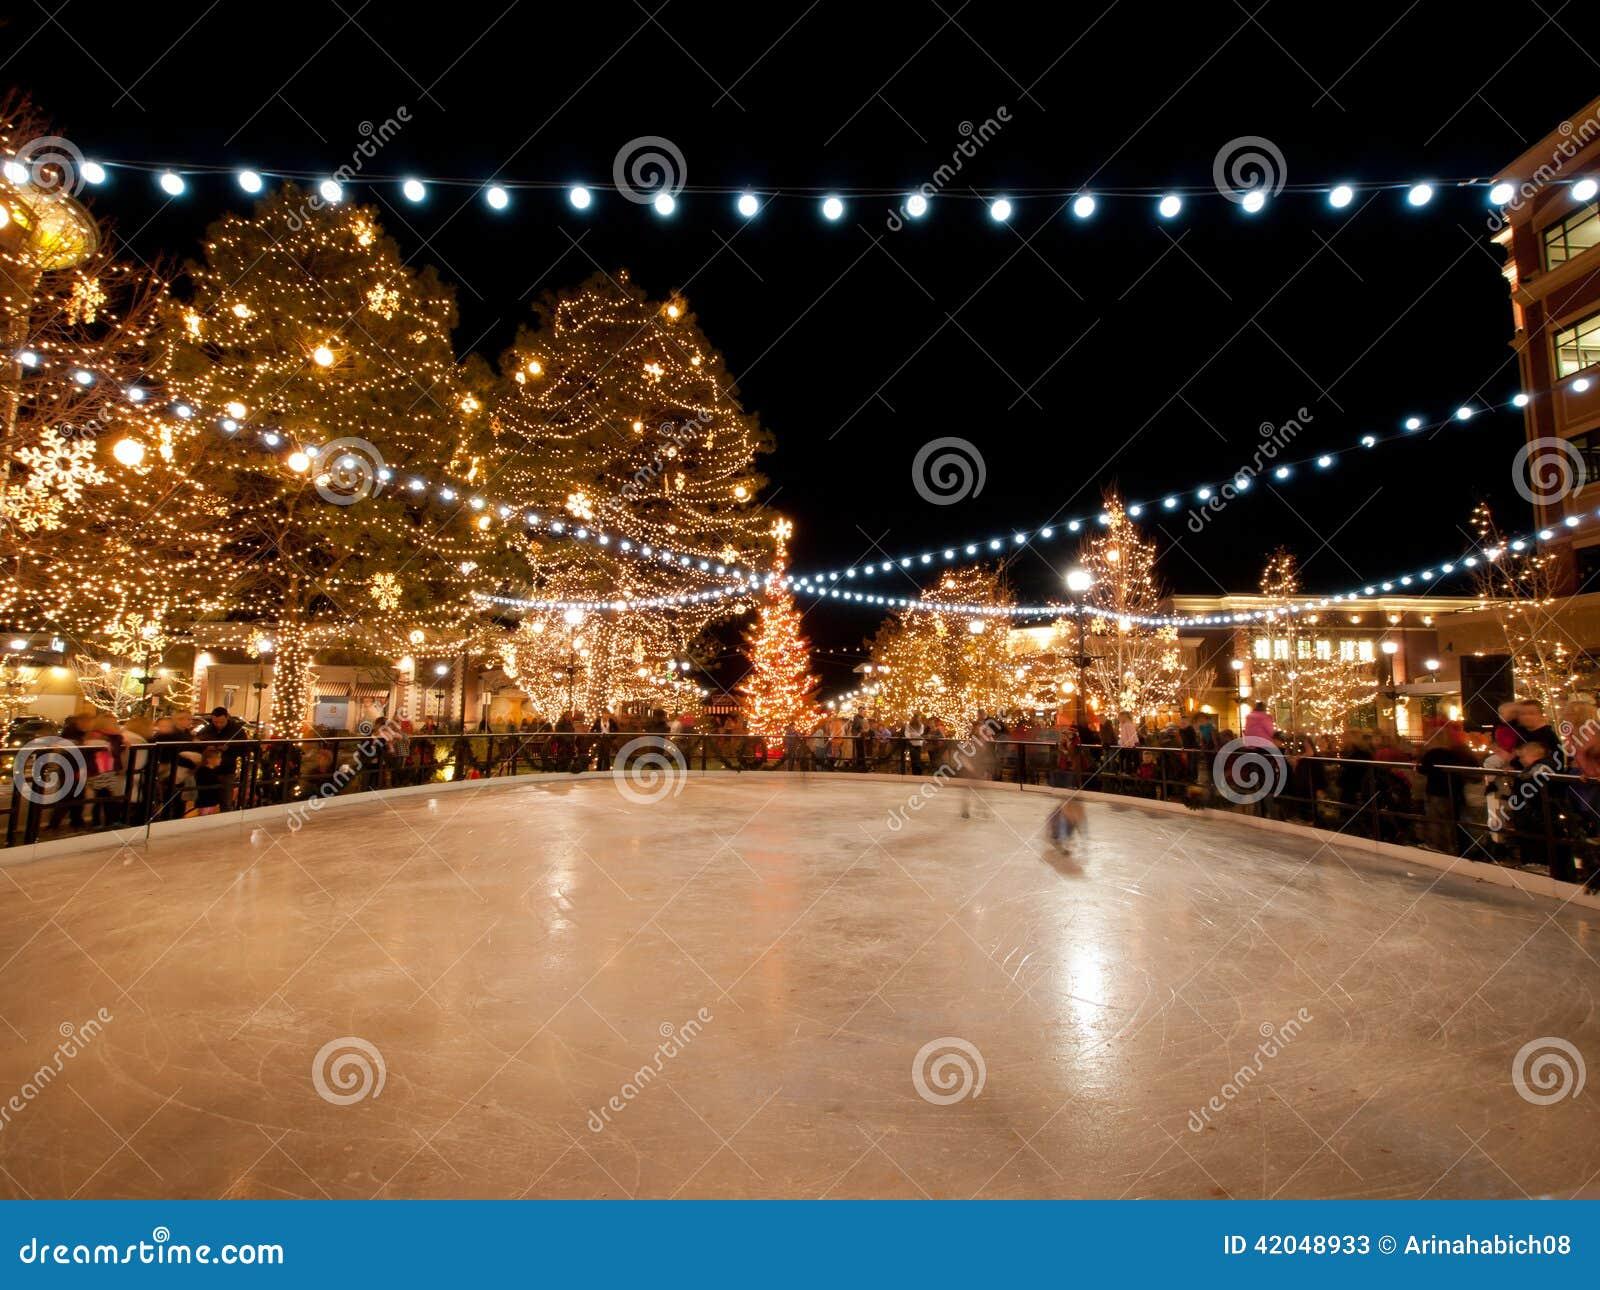 Ice Skating Rink Editorial Stock Photo - Image: 42048933